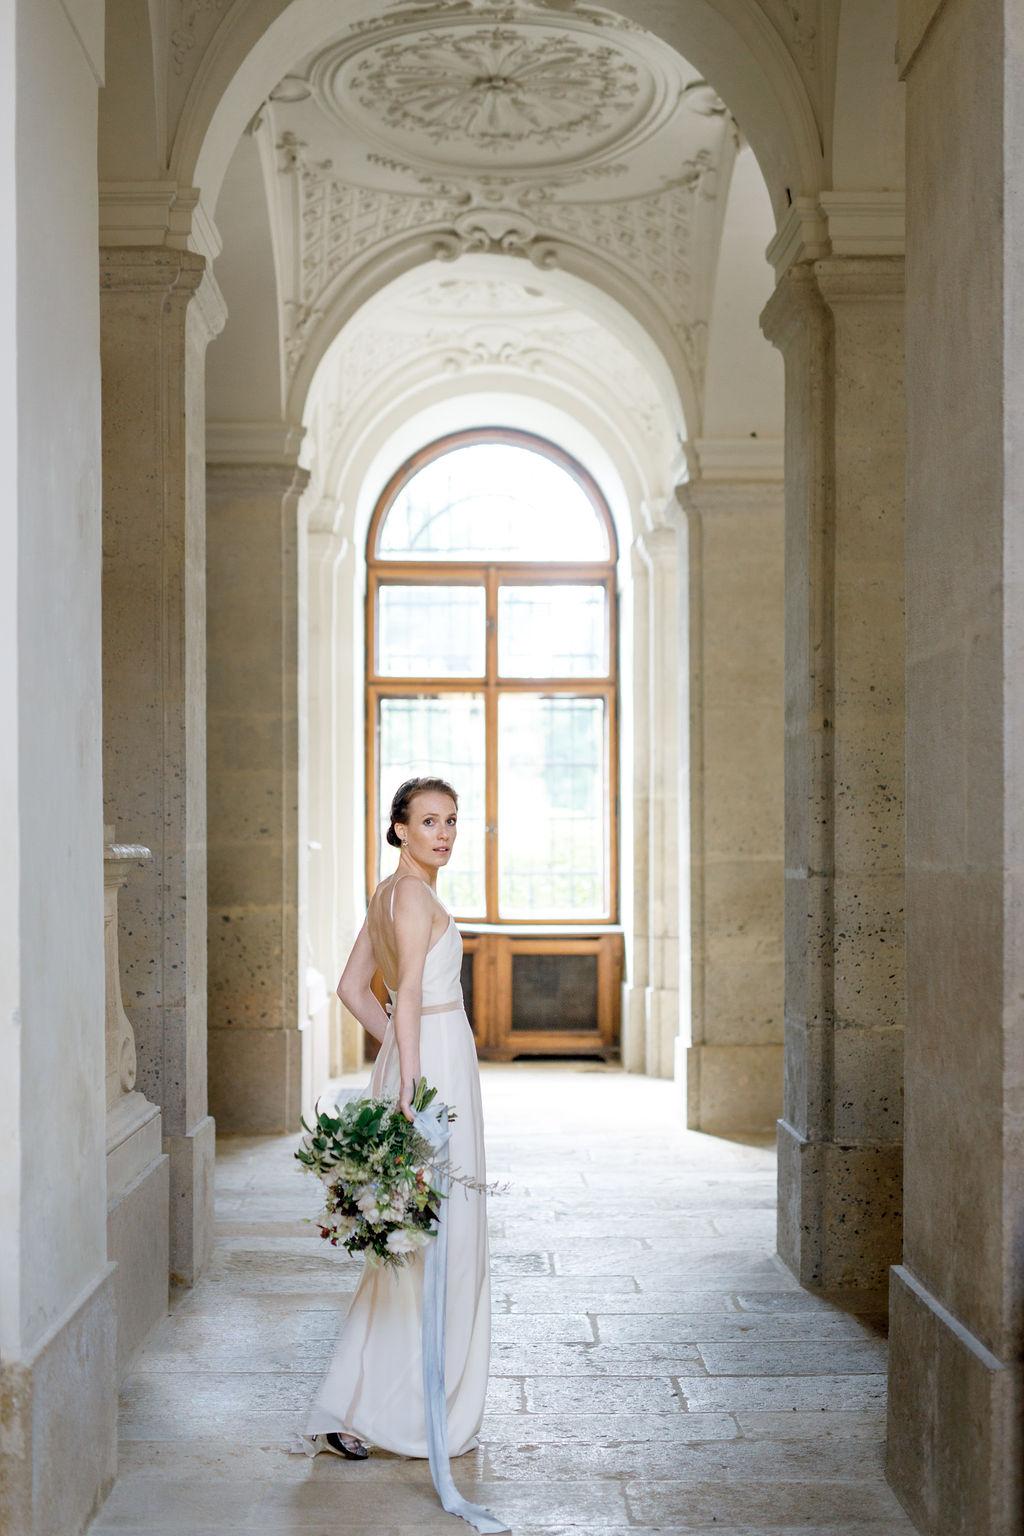 Bridal-Shoot-Eckartsau-Castle-byIconoclashPhotography-0015.jpg